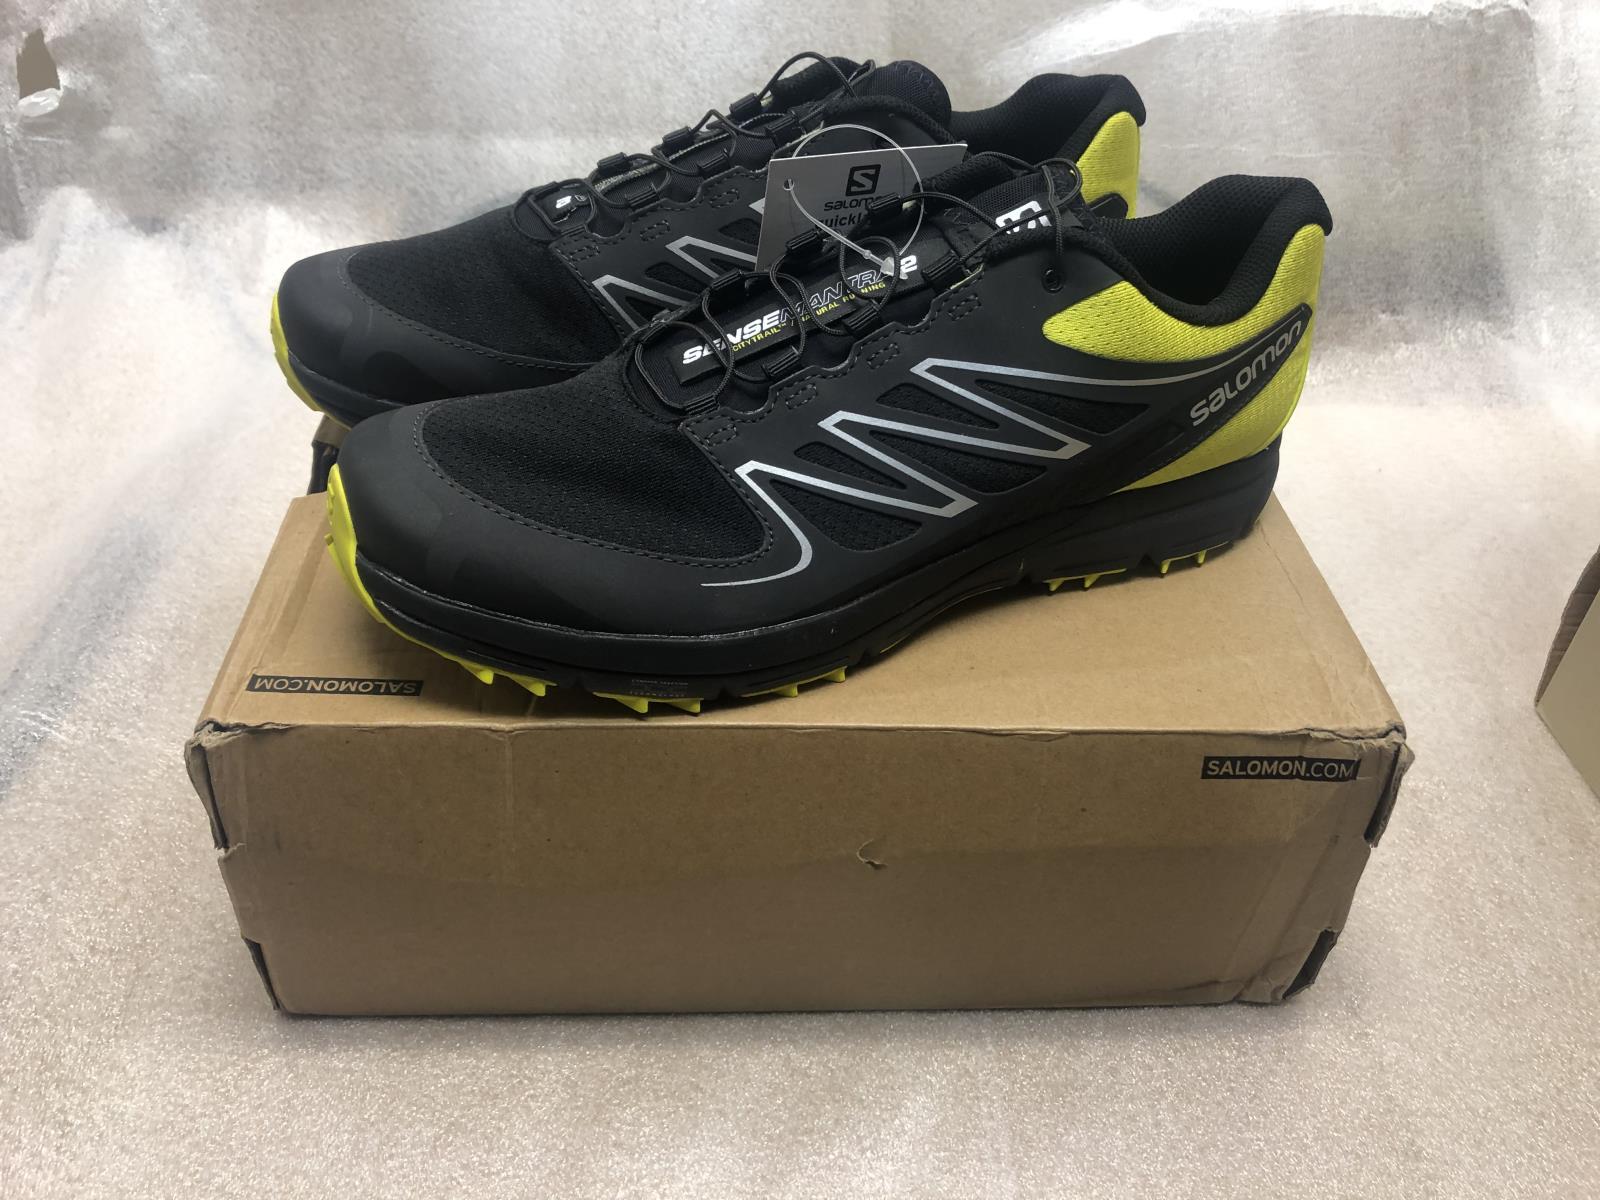 Details about NIB Salomon Sense Mantra 2 Mens Running Sneakers Mimosa Yellow Black Size 9.5